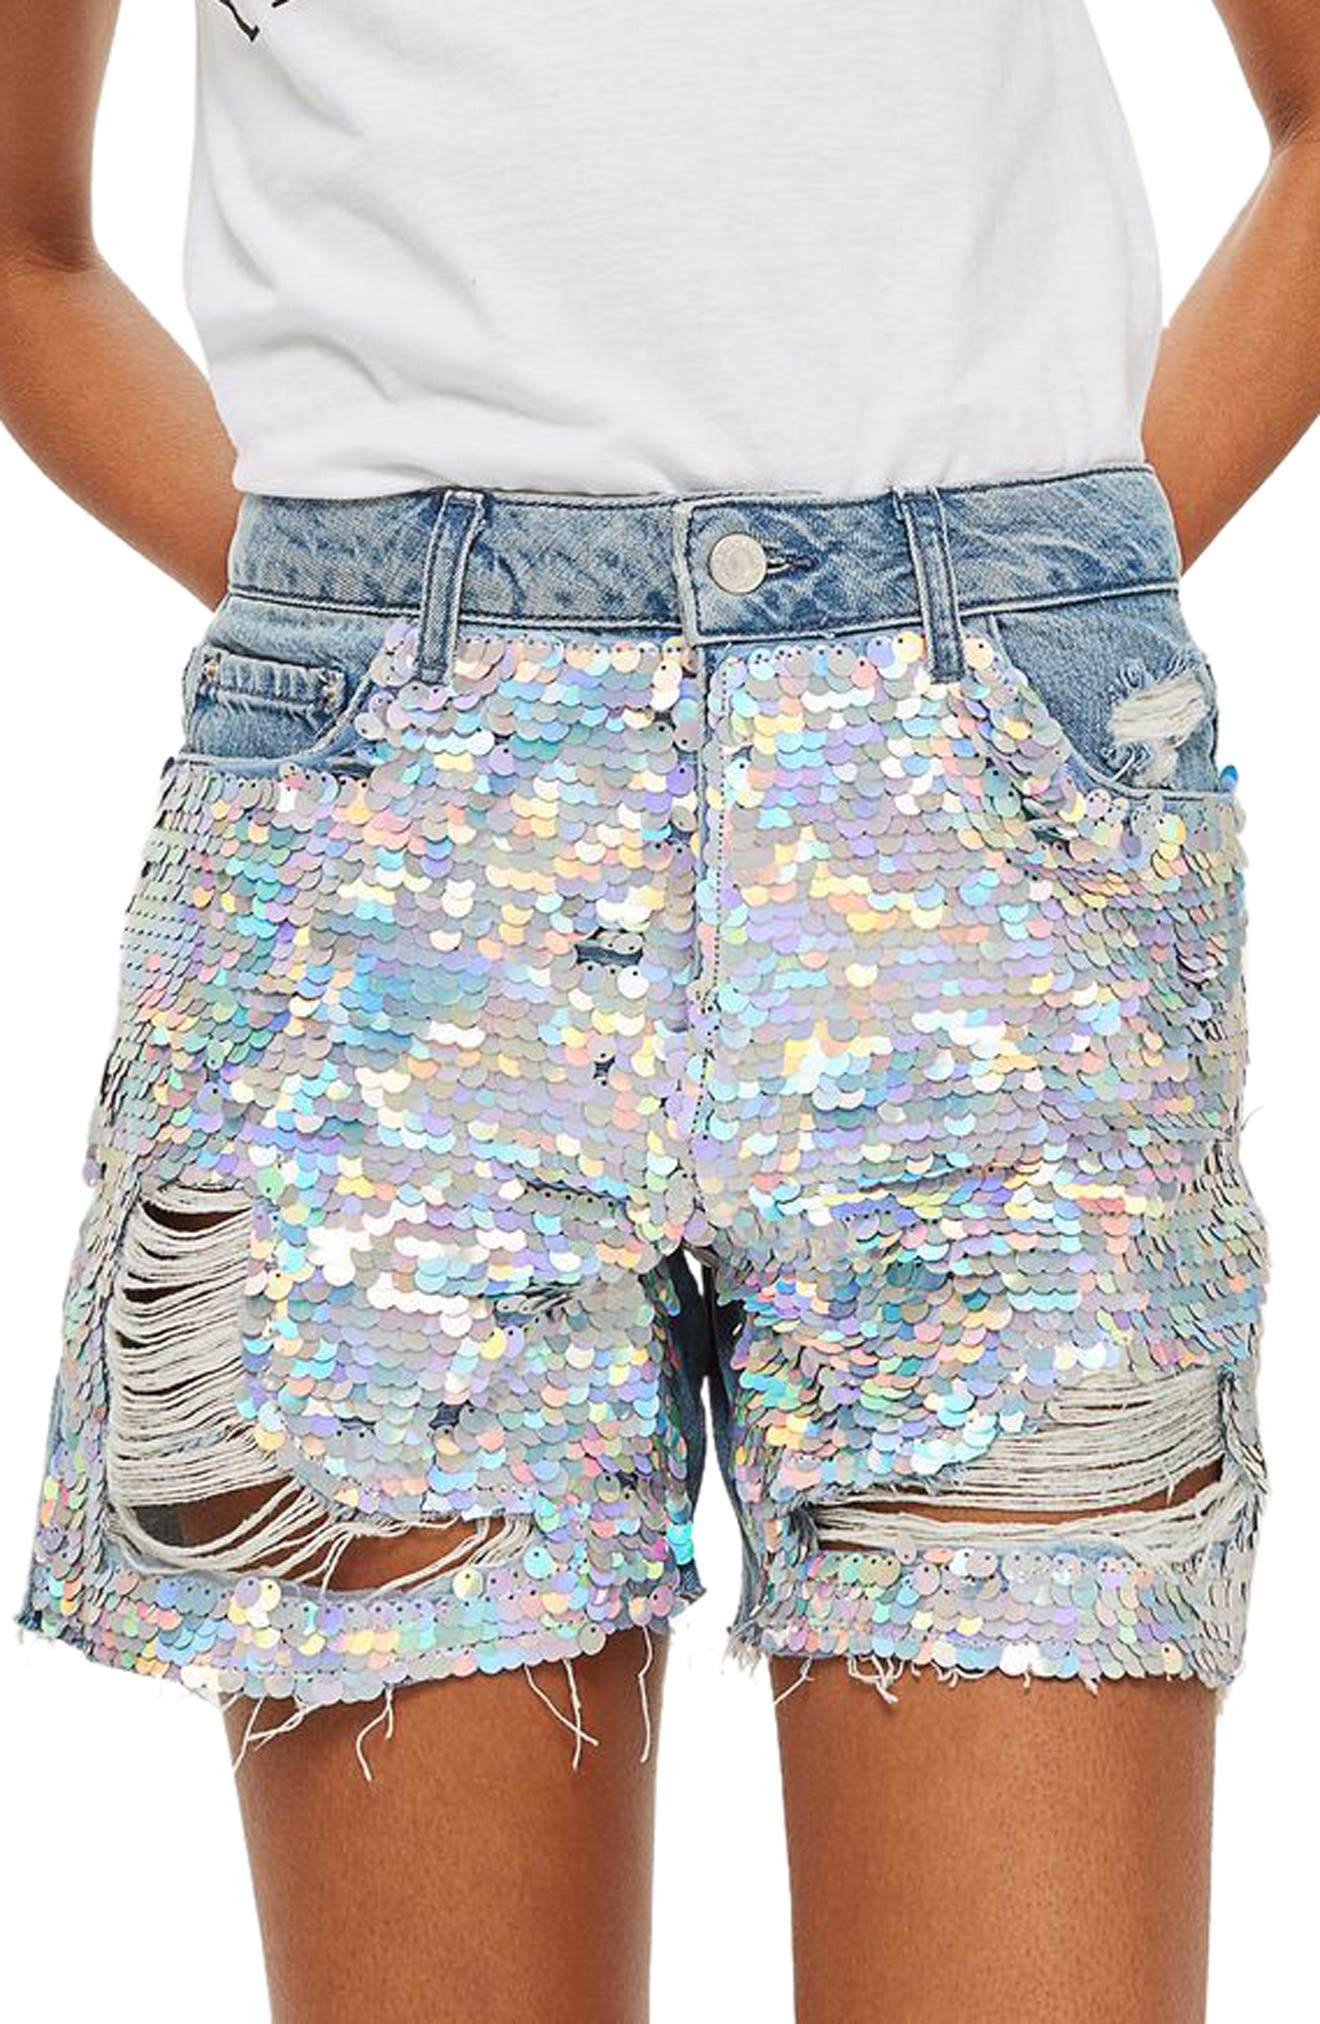 Topshop Ariel Ashley Sequin Boyfriend Shorts